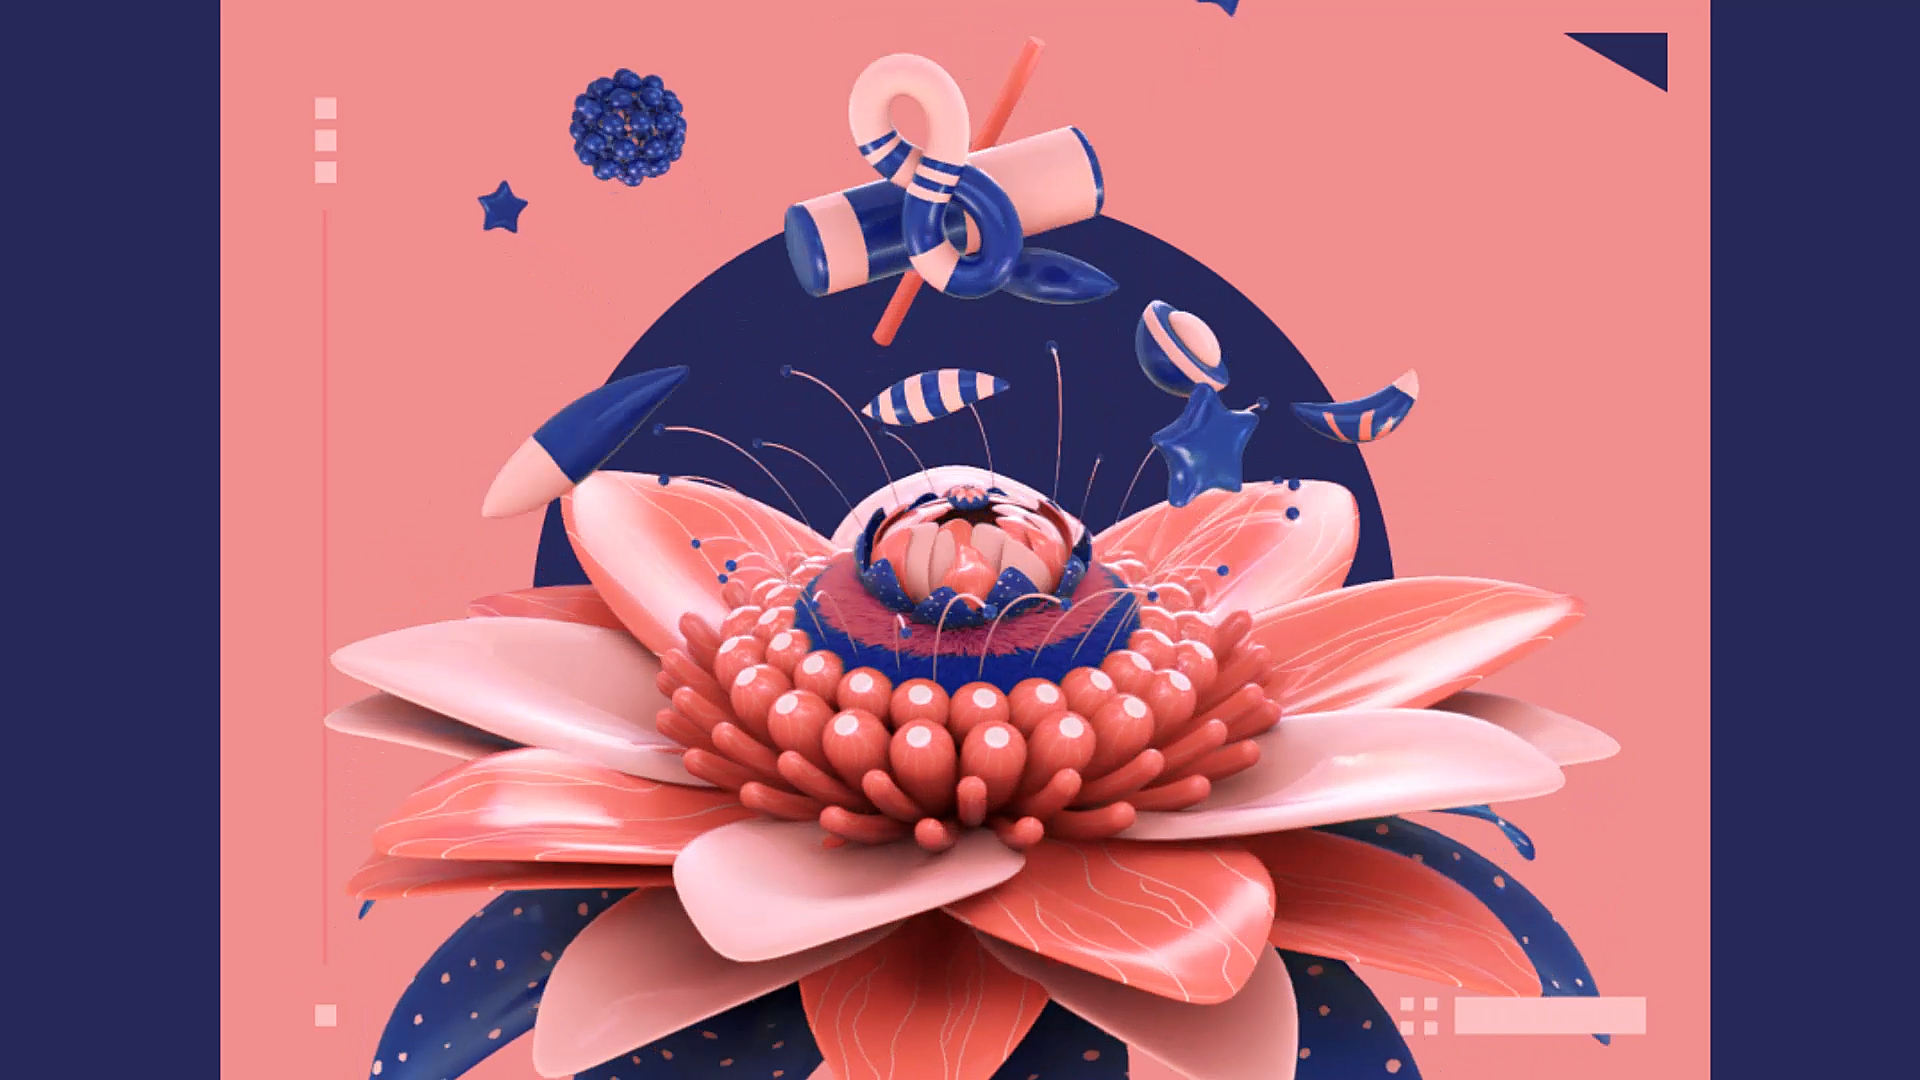 Flower_A_-Landscape